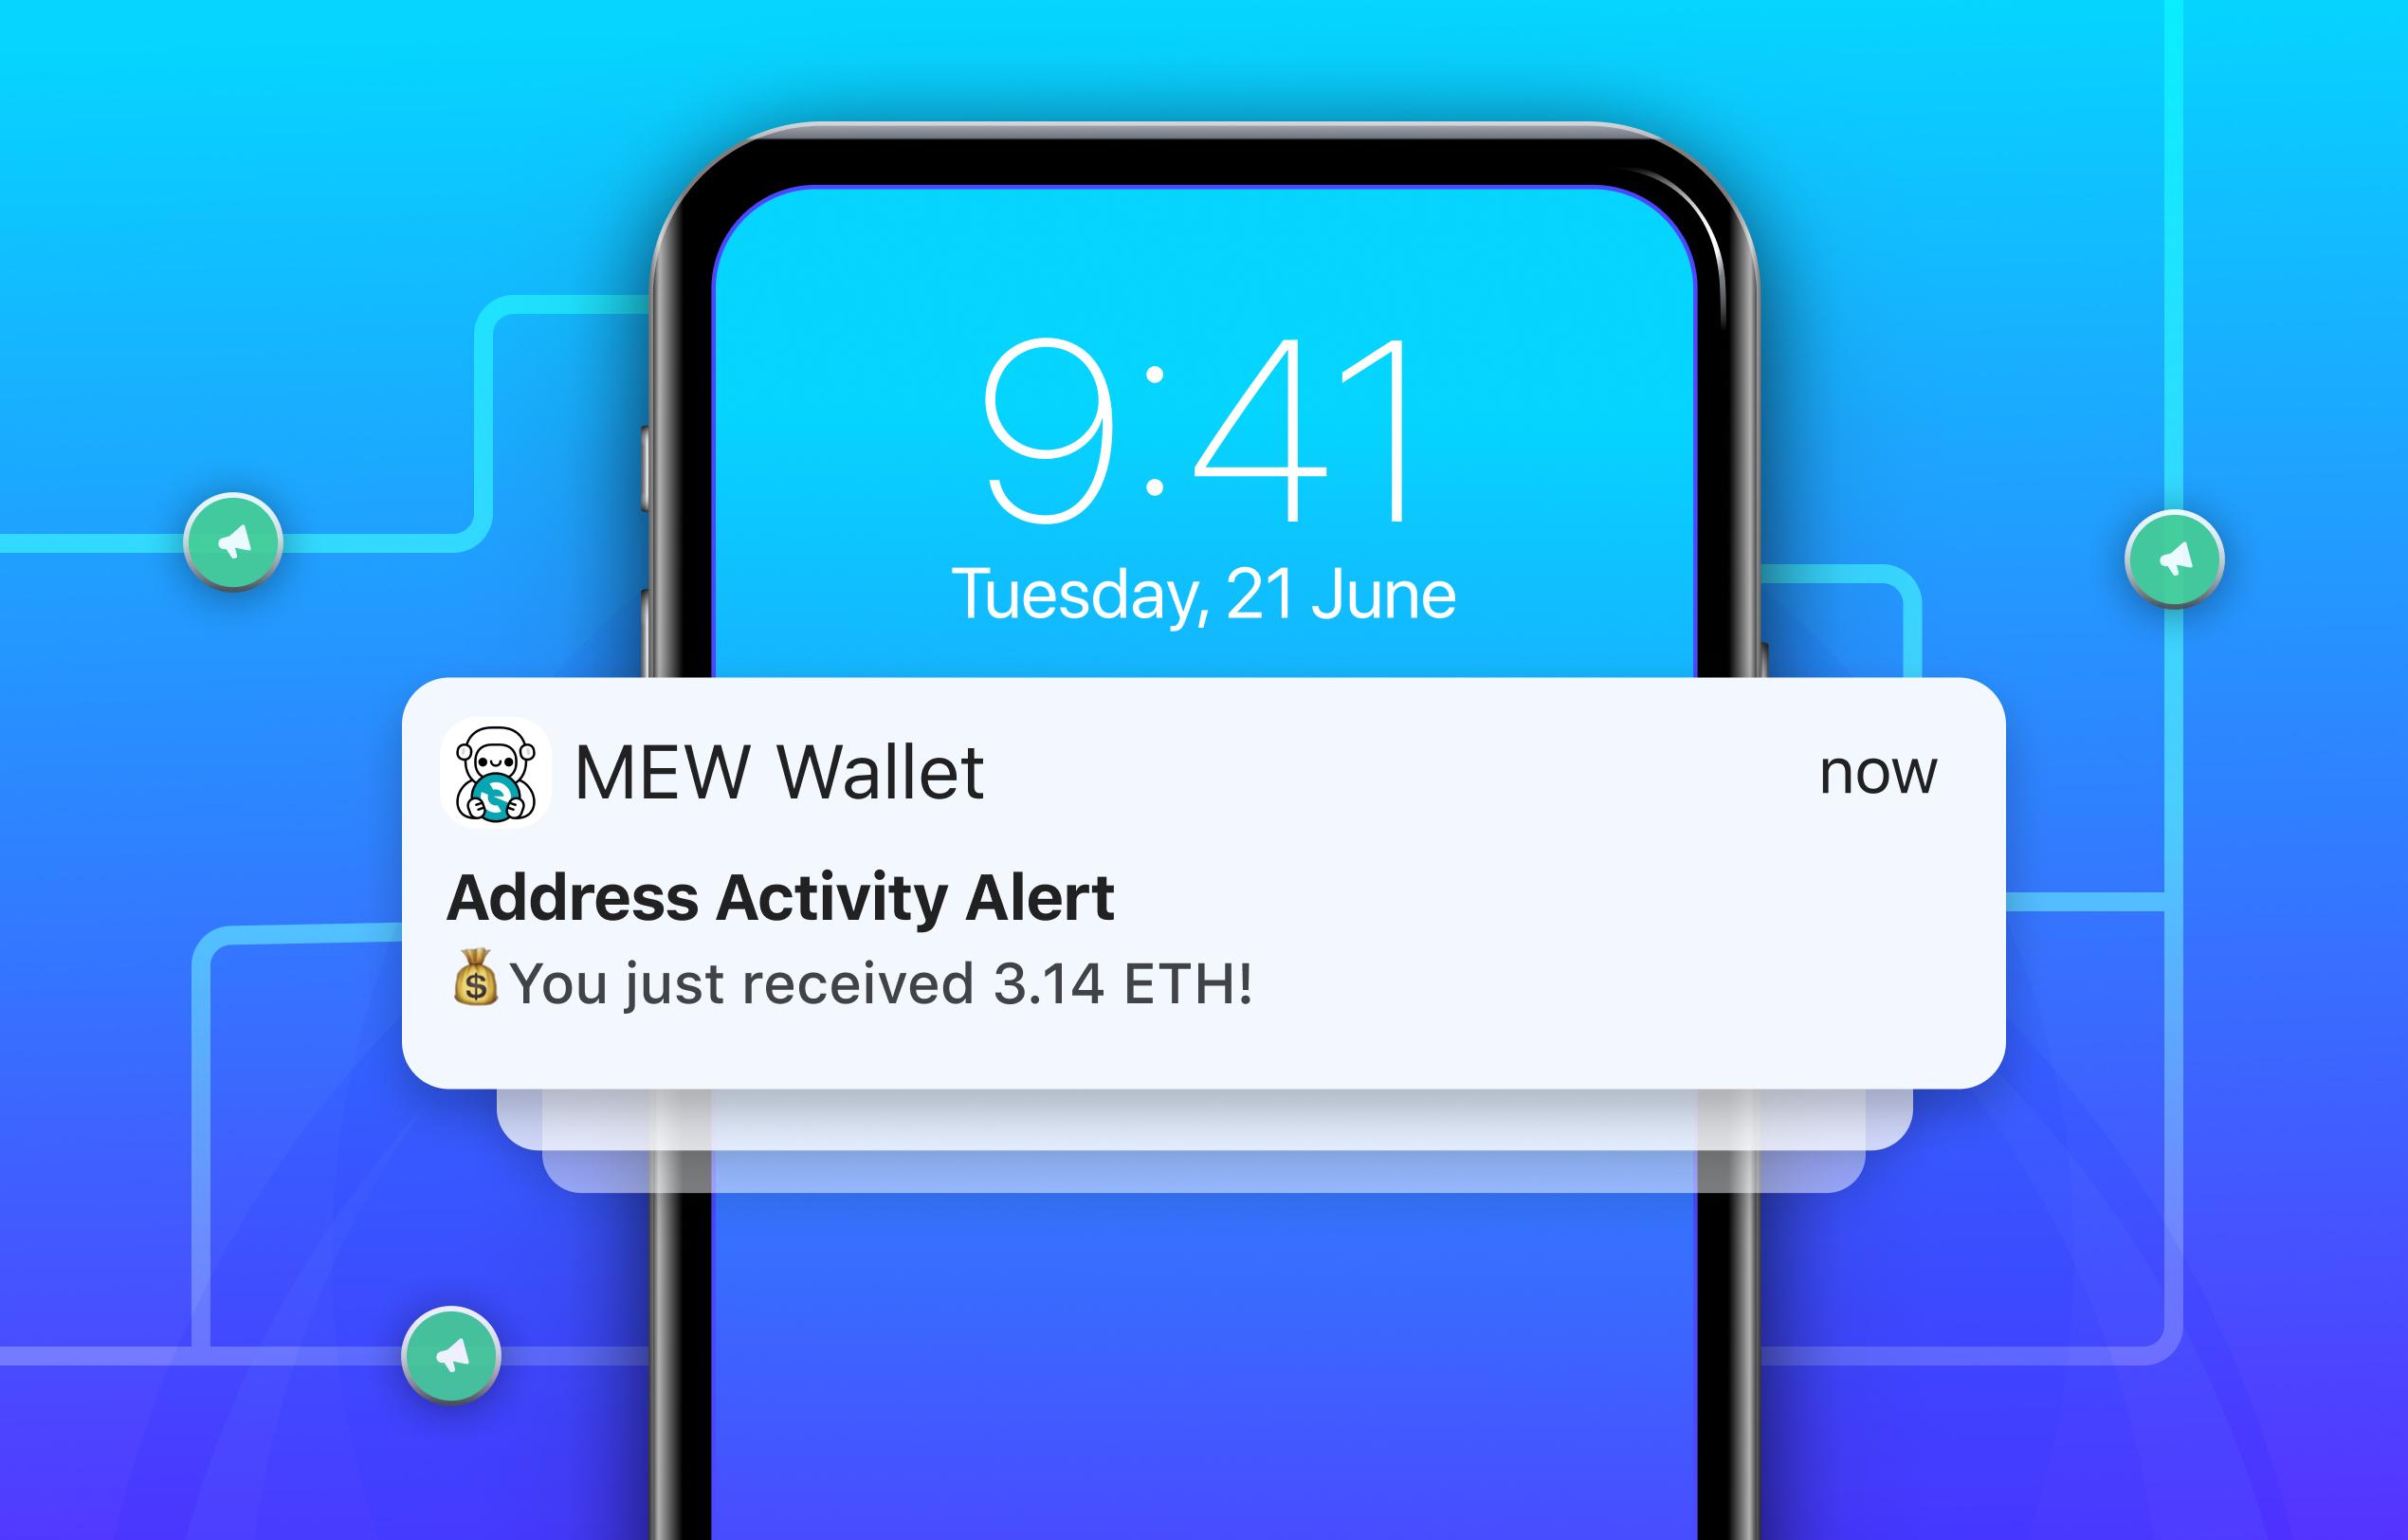 Address activity